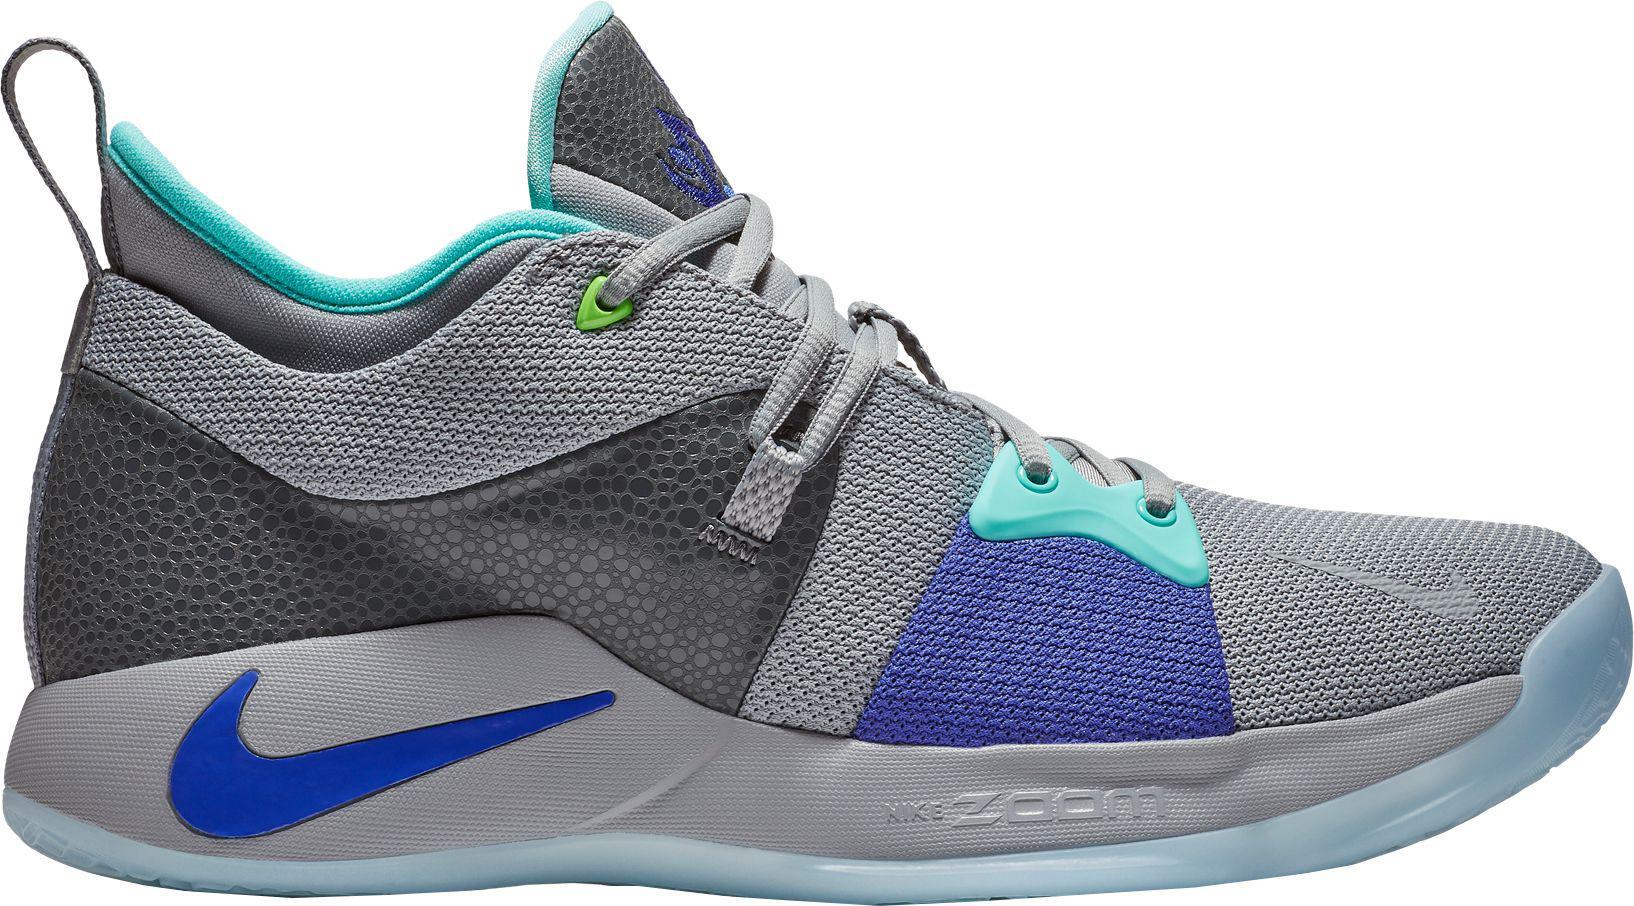 4b59d6b312a2e Nike - Multicolor Pg 2 Basketball Shoes for Men - Lyst